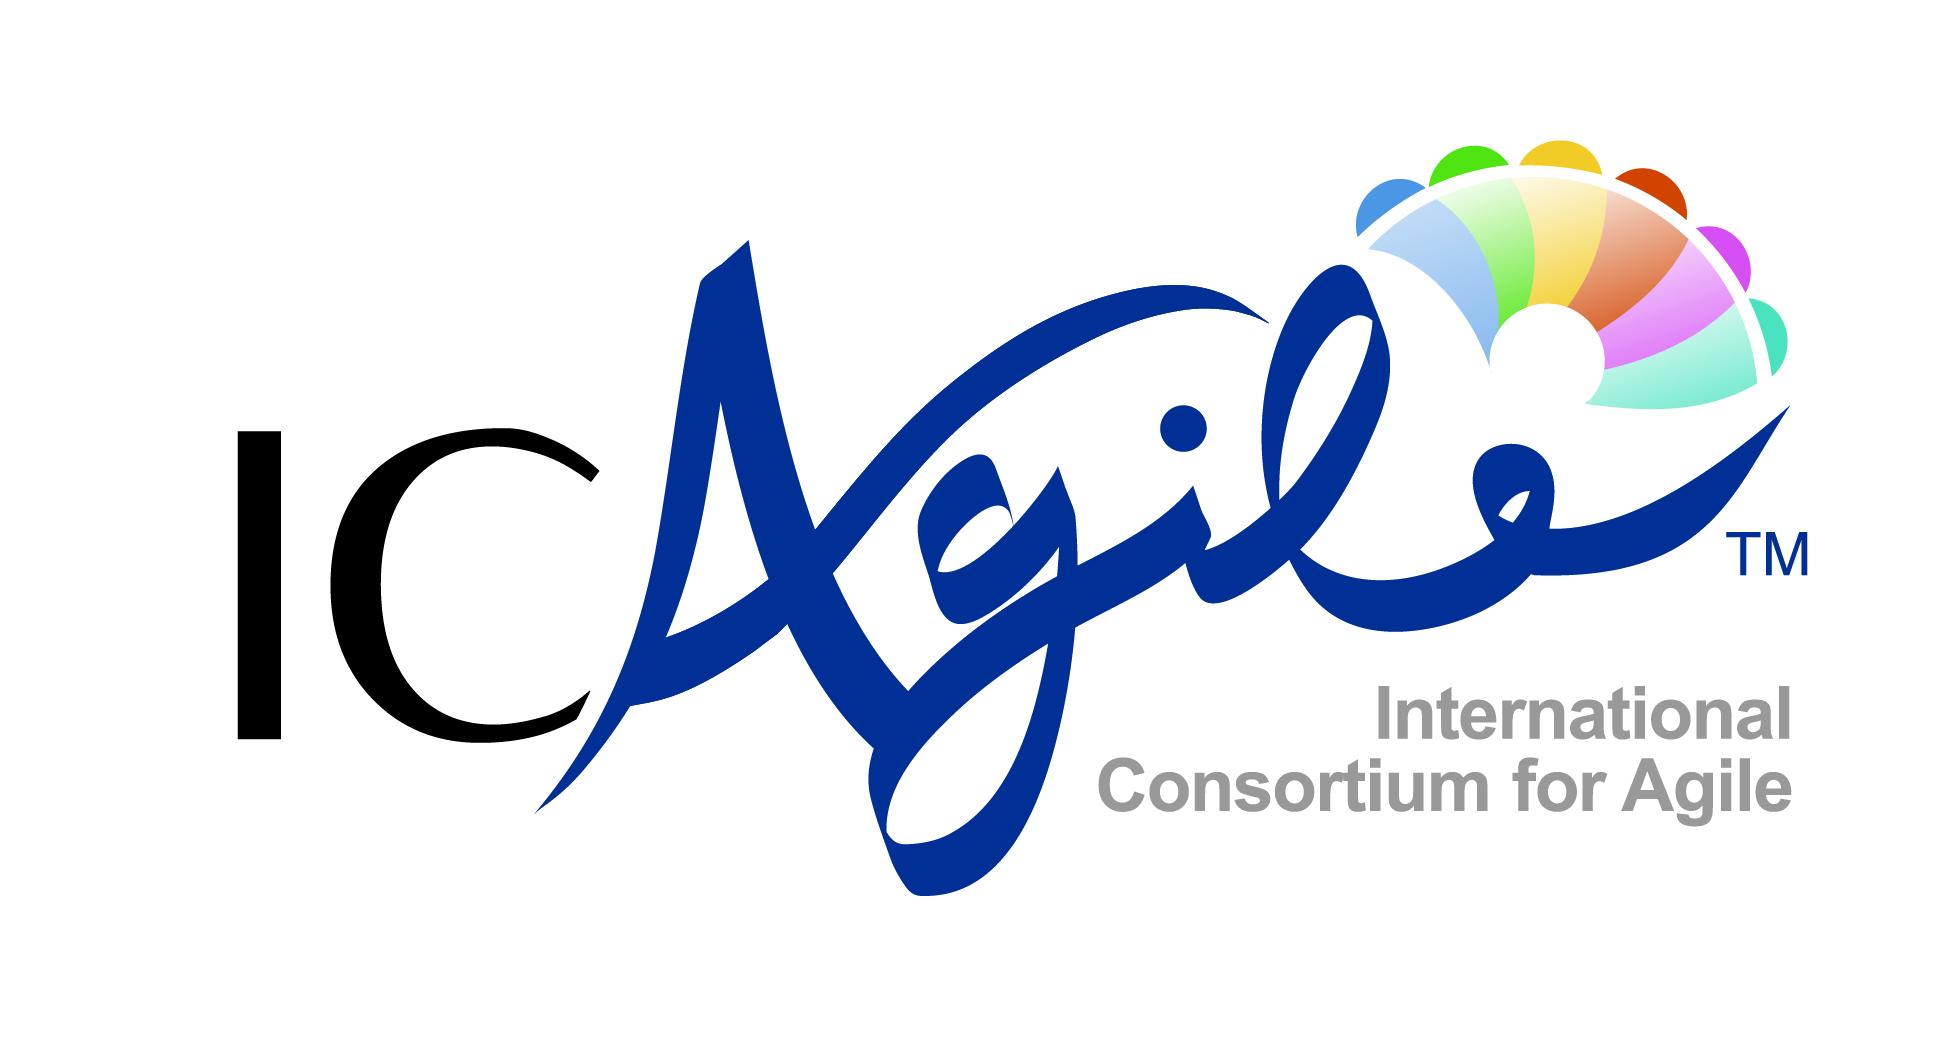 icagile-logo copy 3@2x.png